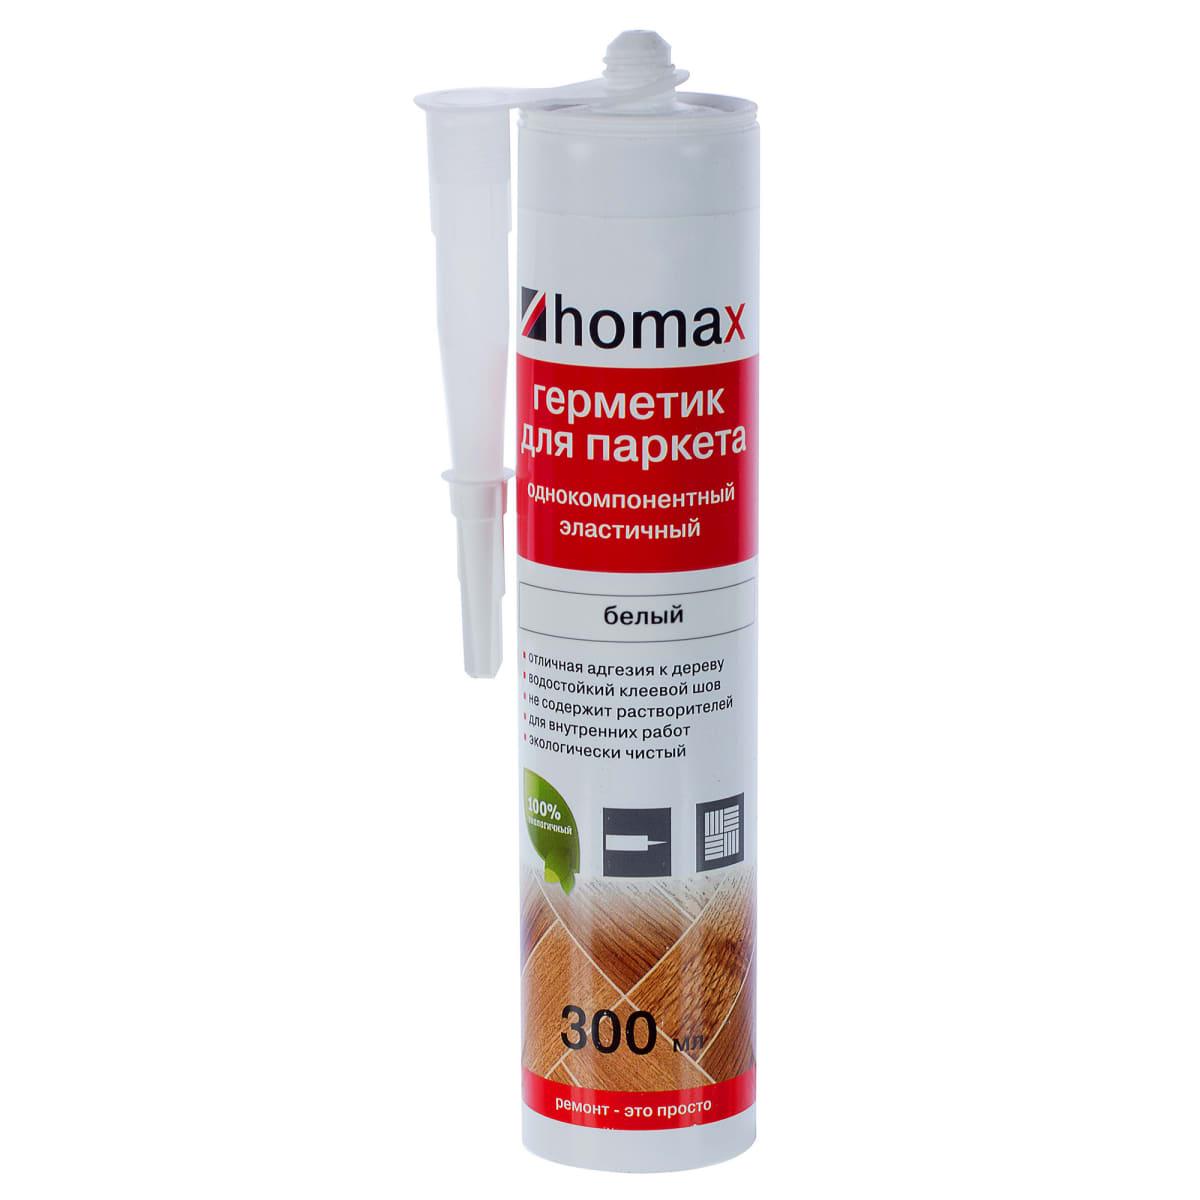 Герметик Homax для паркета 300 мл цвет белый